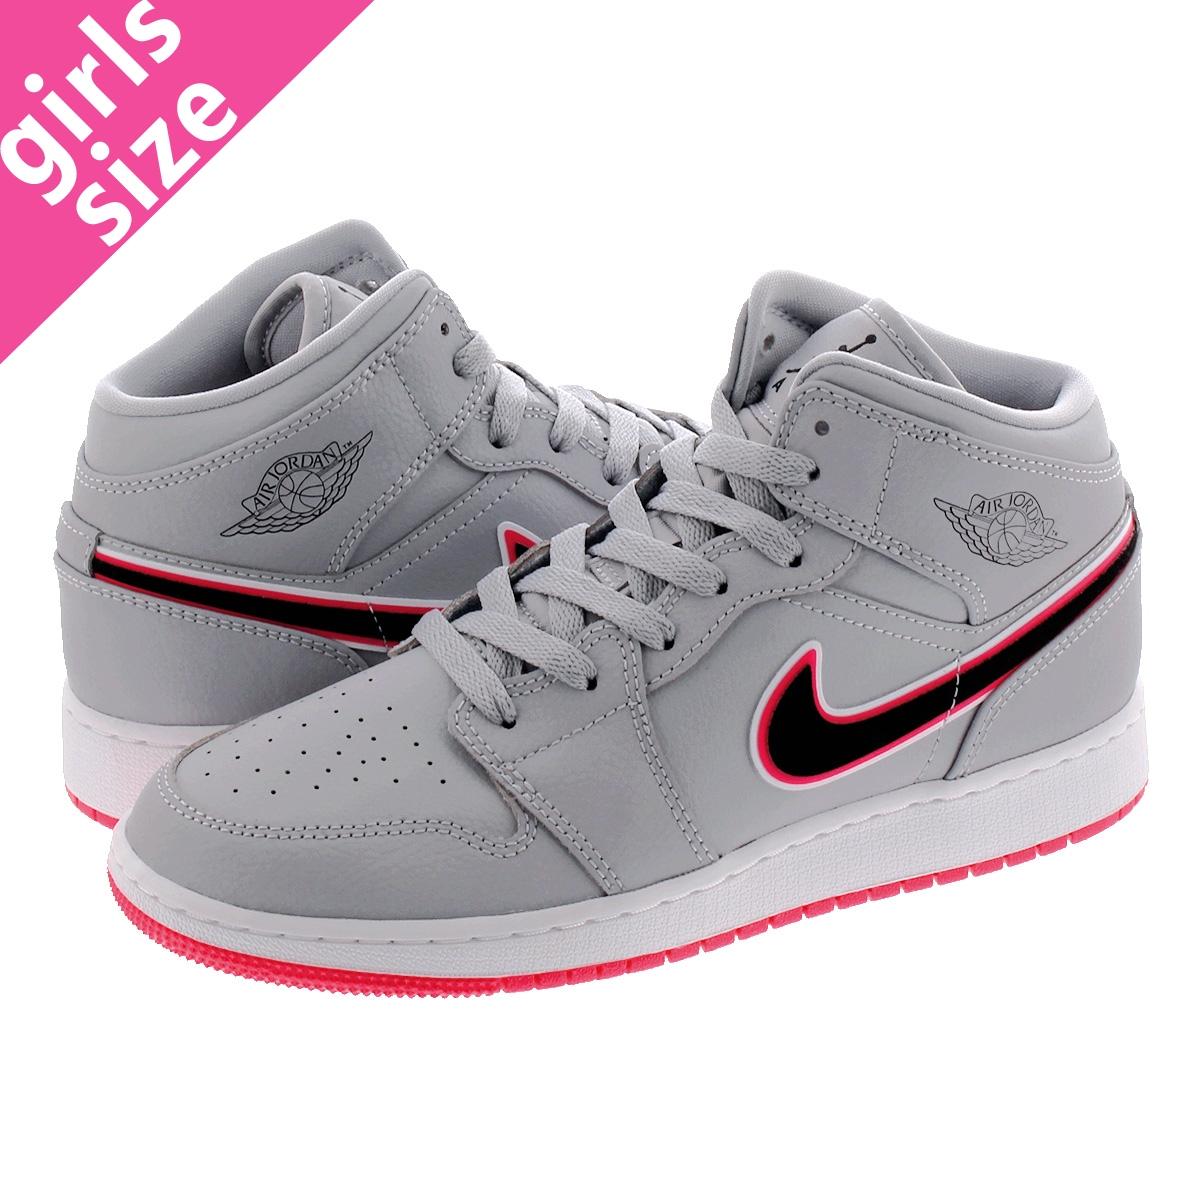 separation shoes 3341d 26c18 NIKE AIR JORDAN 1 MID GG Nike Air Jordan 1 mid GG WOLF GREY/RACER  PINK/WHITE/BLACK 555,112-060